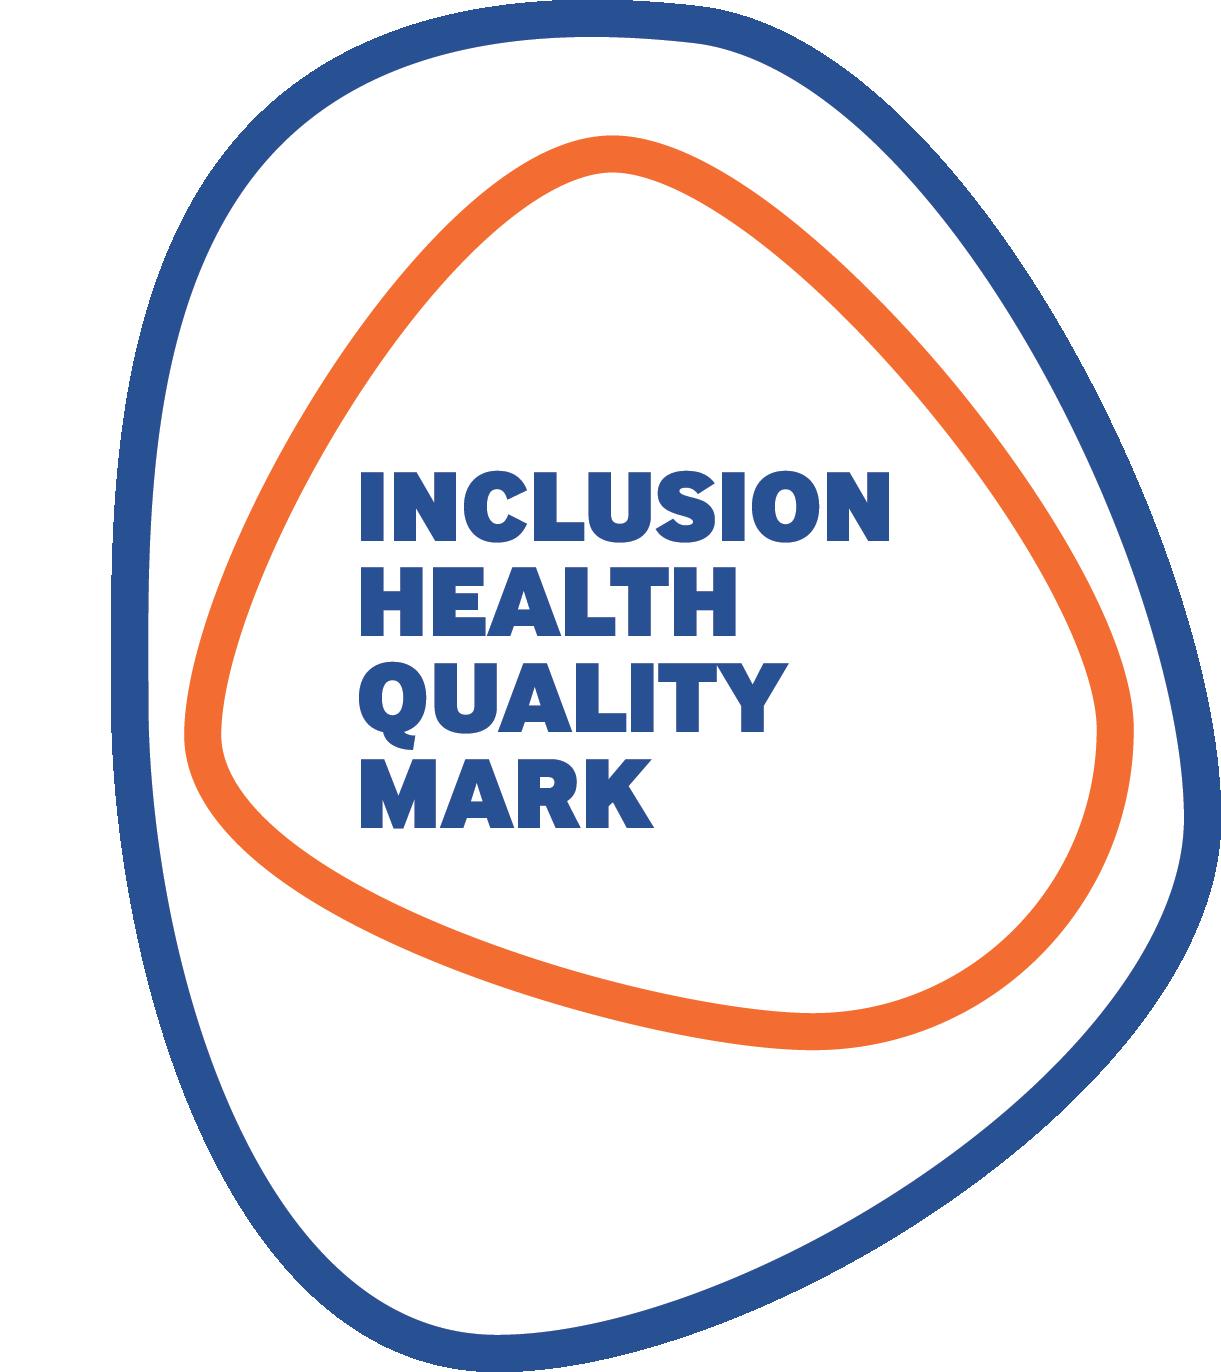 Inclusion Health Quality Mark